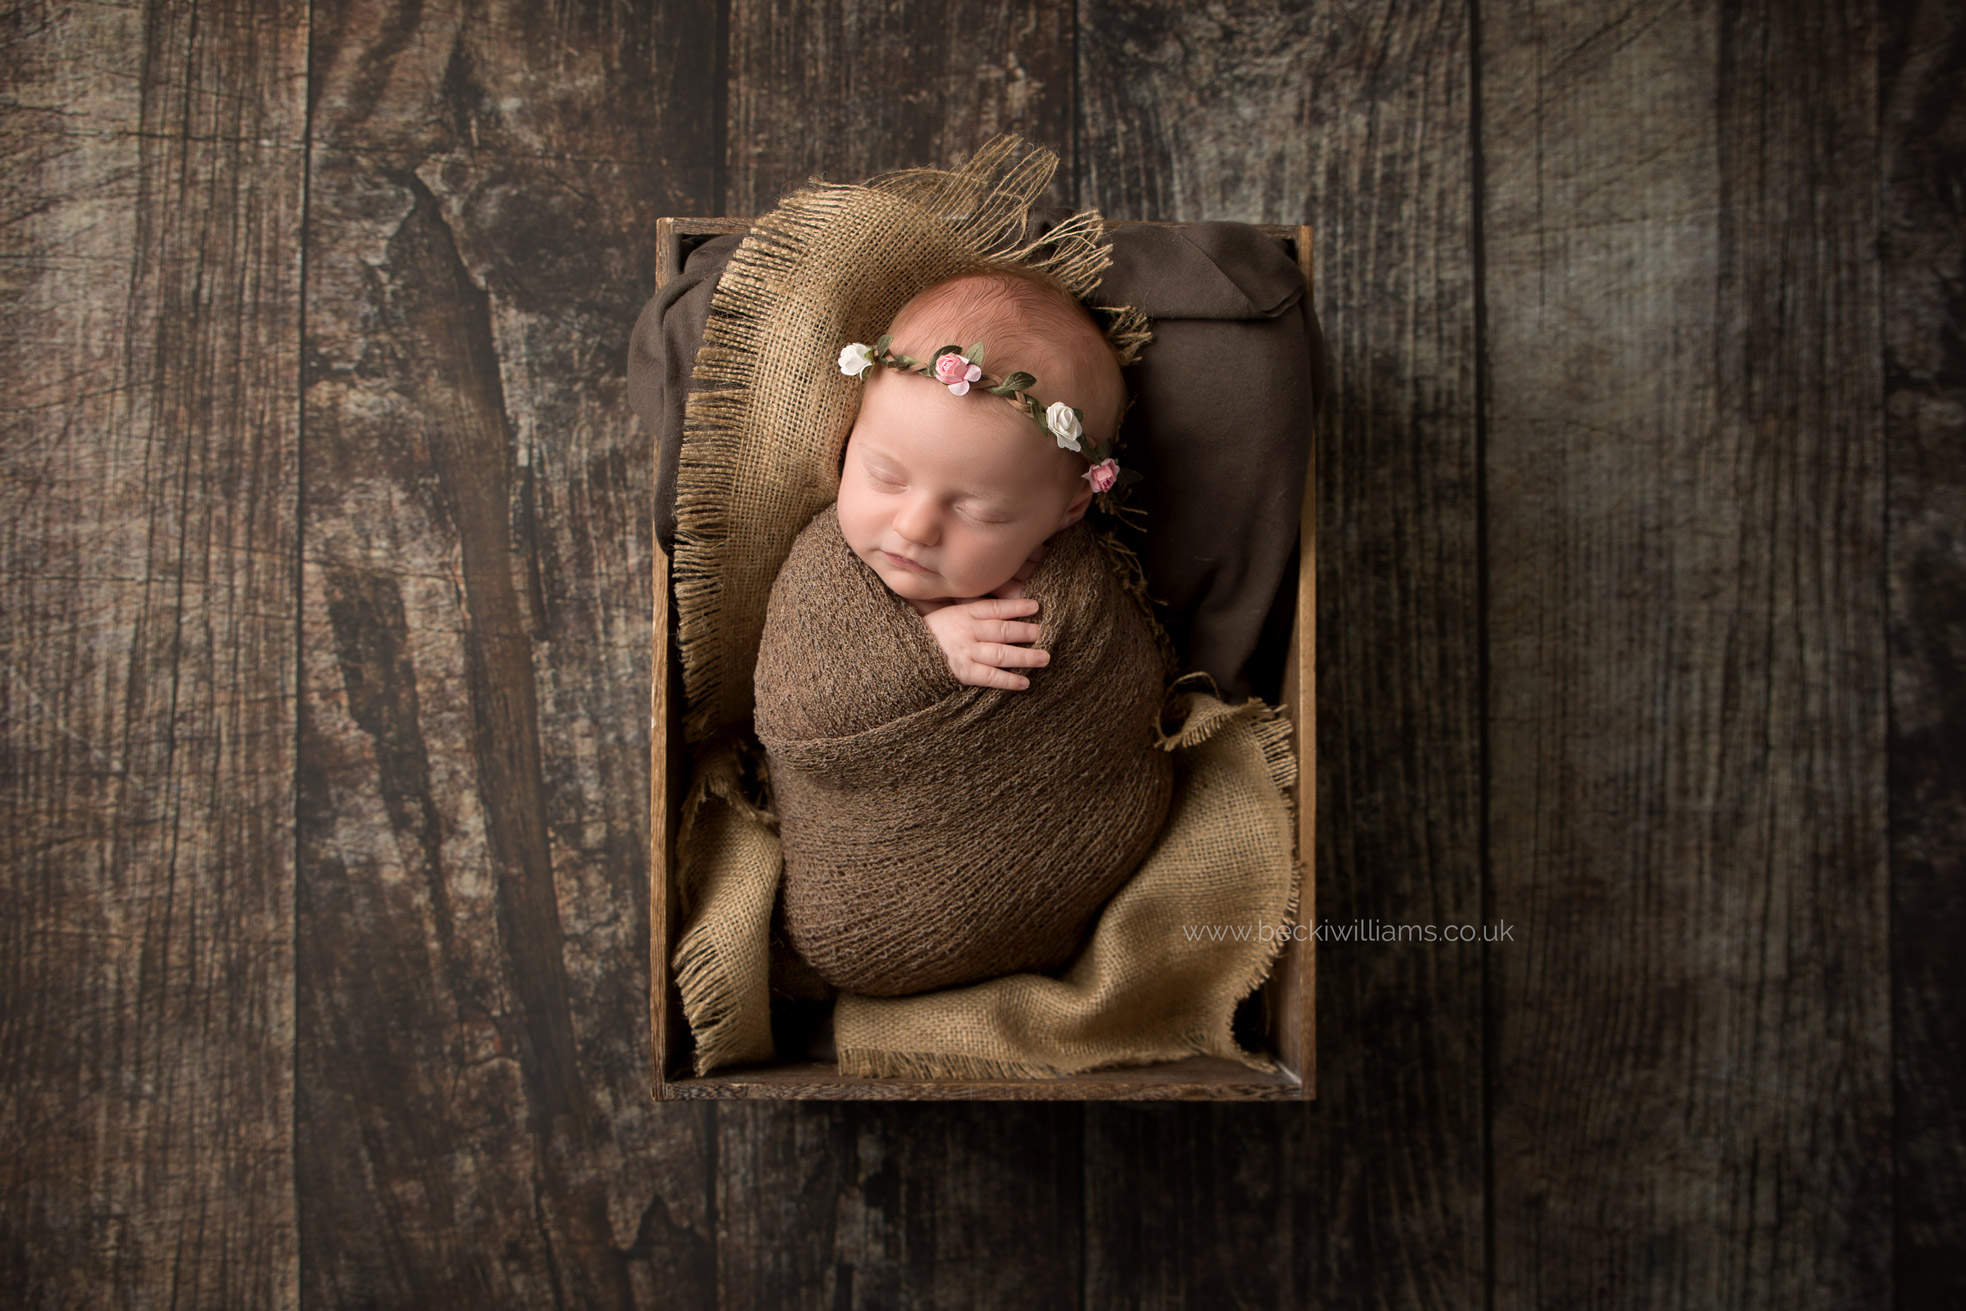 newborn-photography-st-albans-cute-studio-crate-brown-floral-autumn.jpg